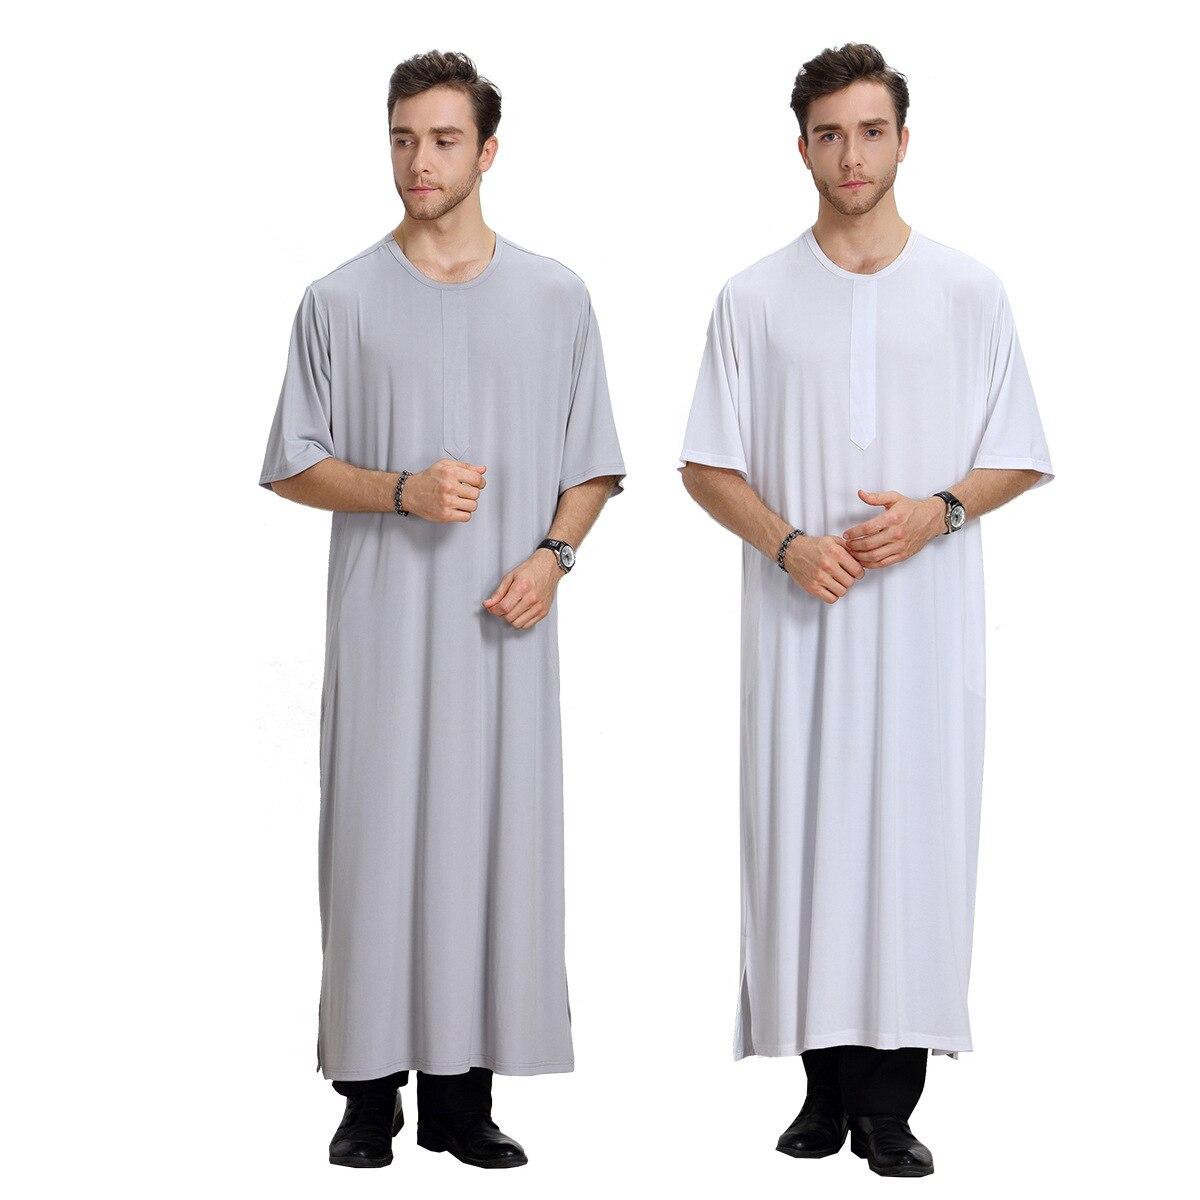 Mixed Batch Muslim Arab Middle East Of Capri Crew Neck MEN'S Robe Th807